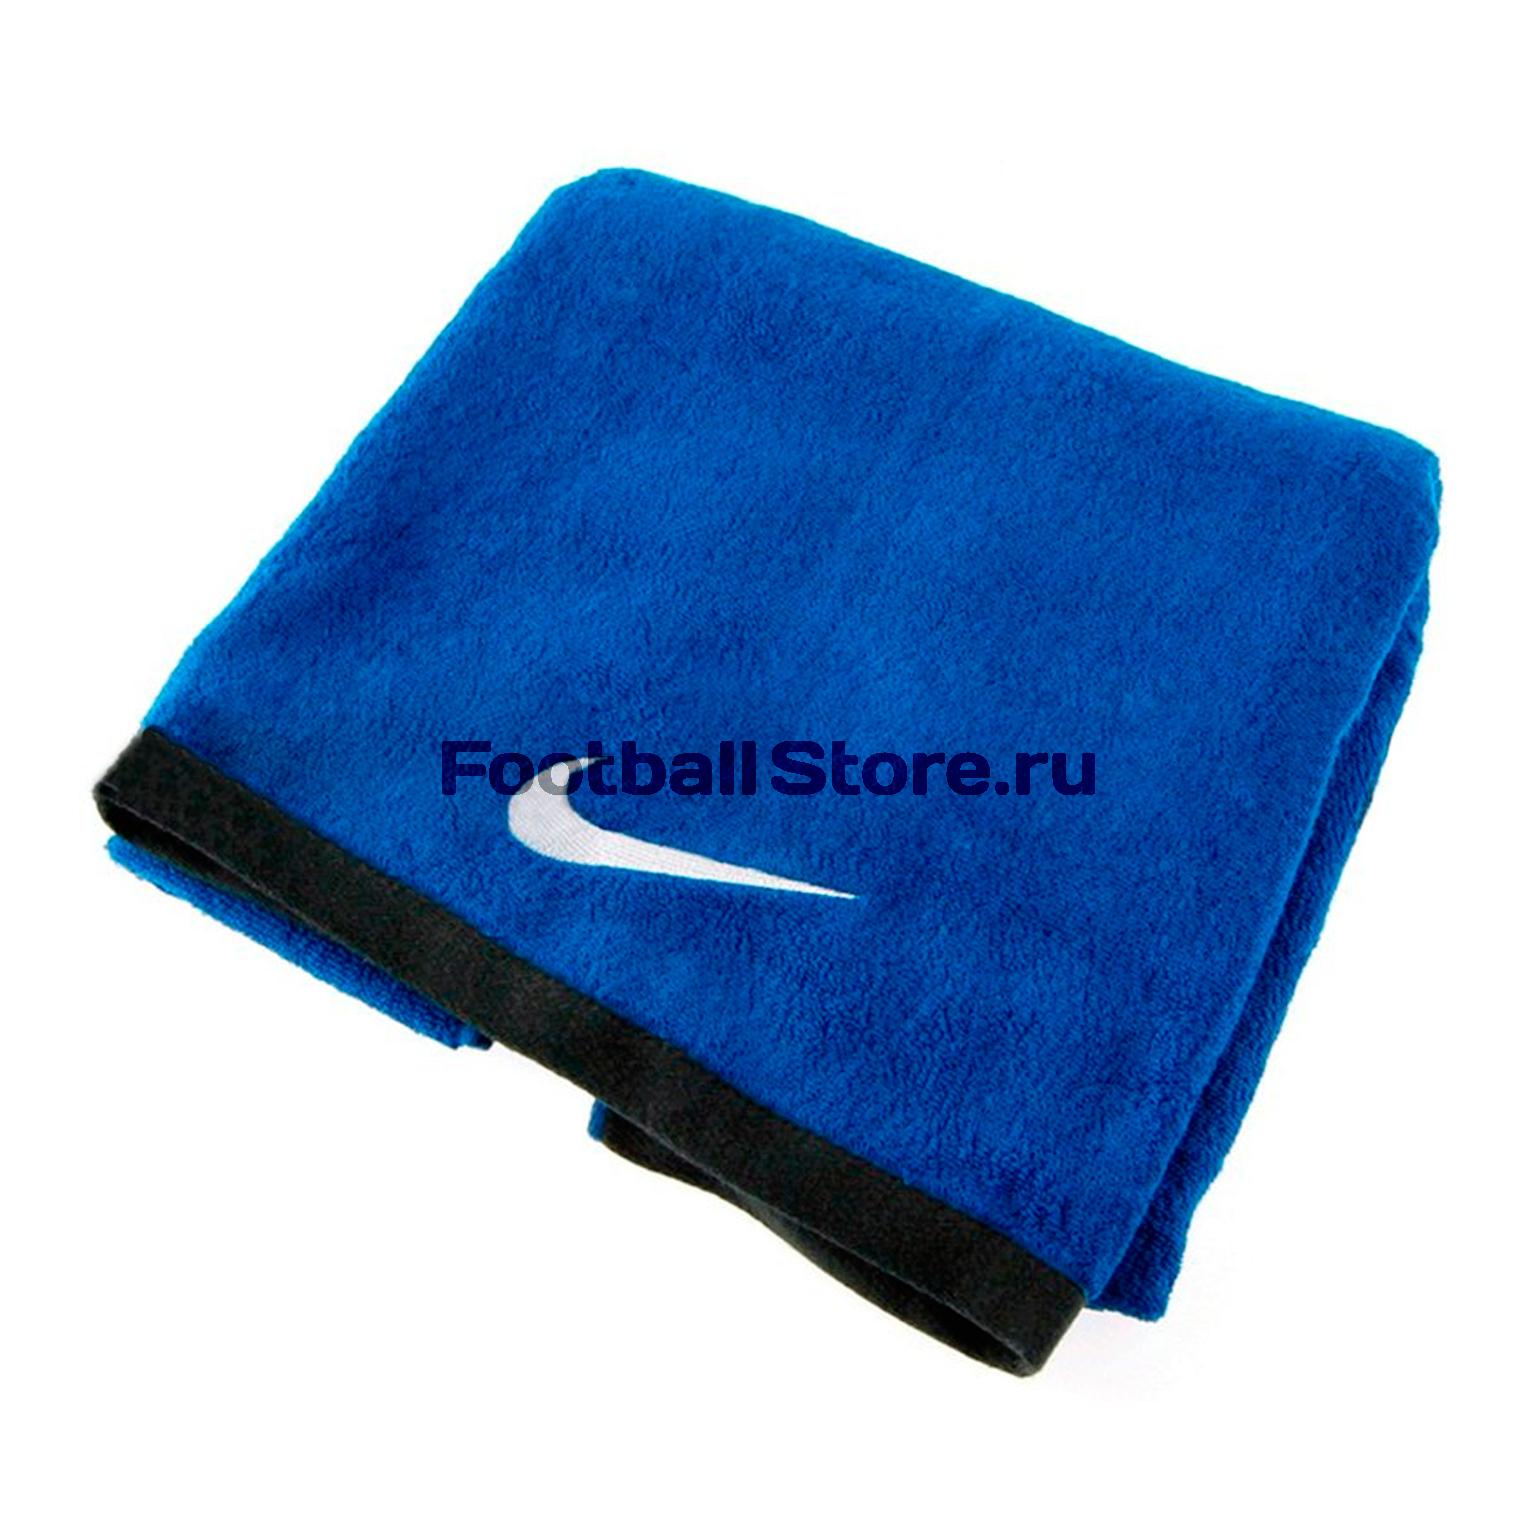 Полотенце Nike Fundamental Towel N.E.T.17.452.LG ceramic oil rubbed bronze crystal hanger towel rack holder single towel bar new